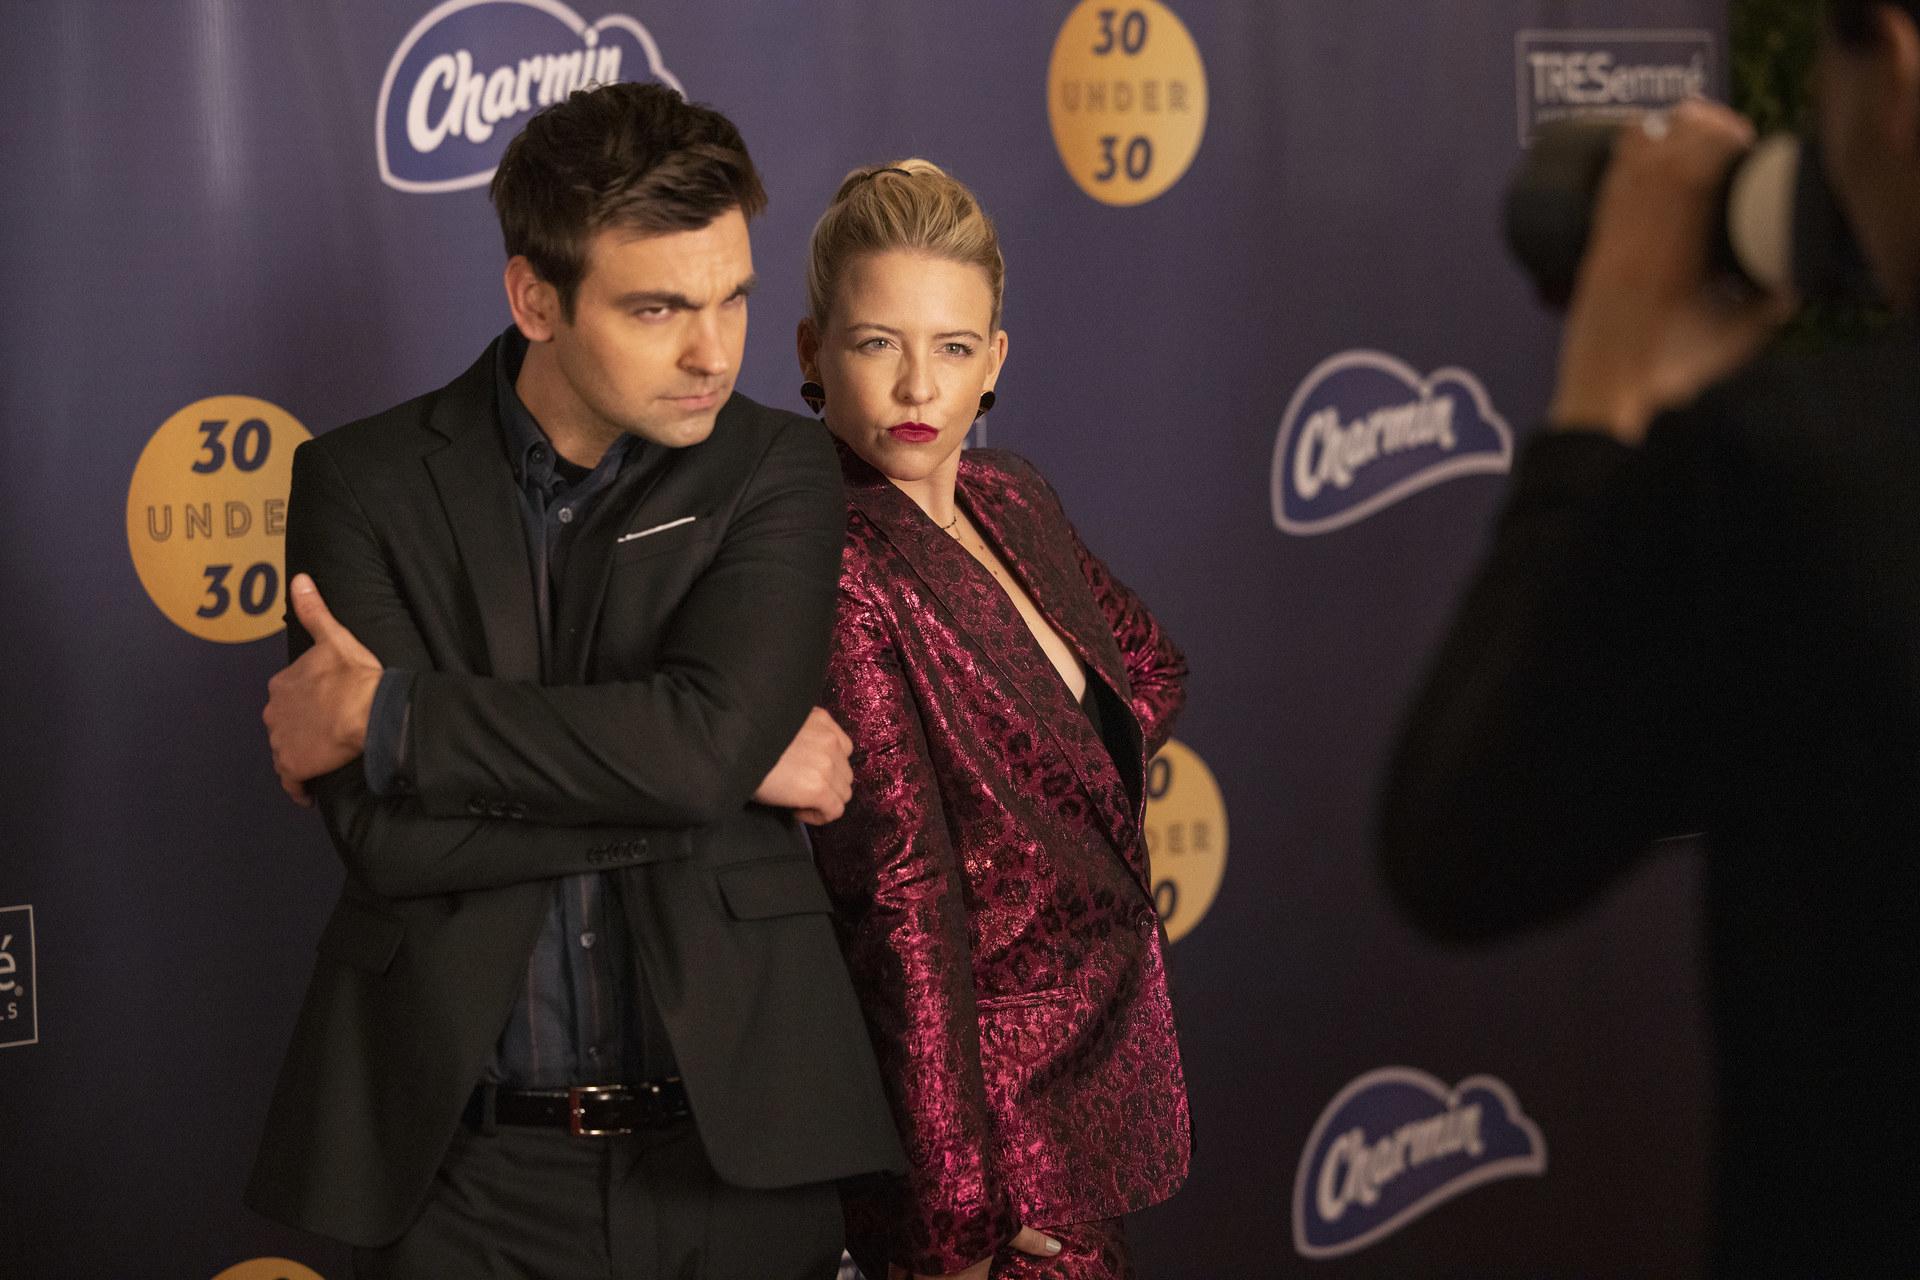 Drew Tarver and Helene York pose on a red carpet